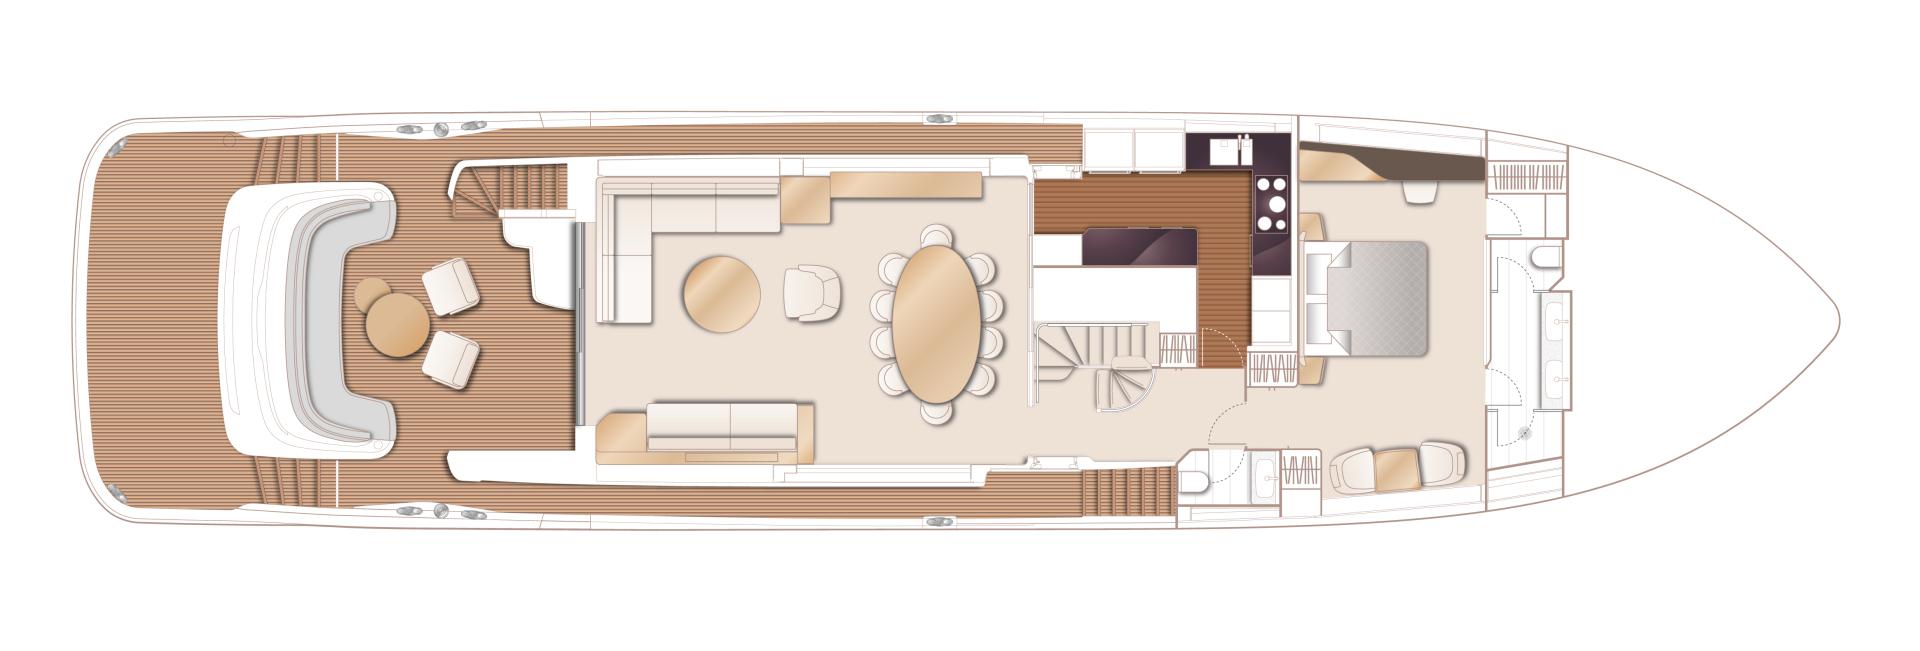 Princess-95 Motor Yacht 2022-Y95 Unknown-Florida-United States-1582782 | Thumbnail